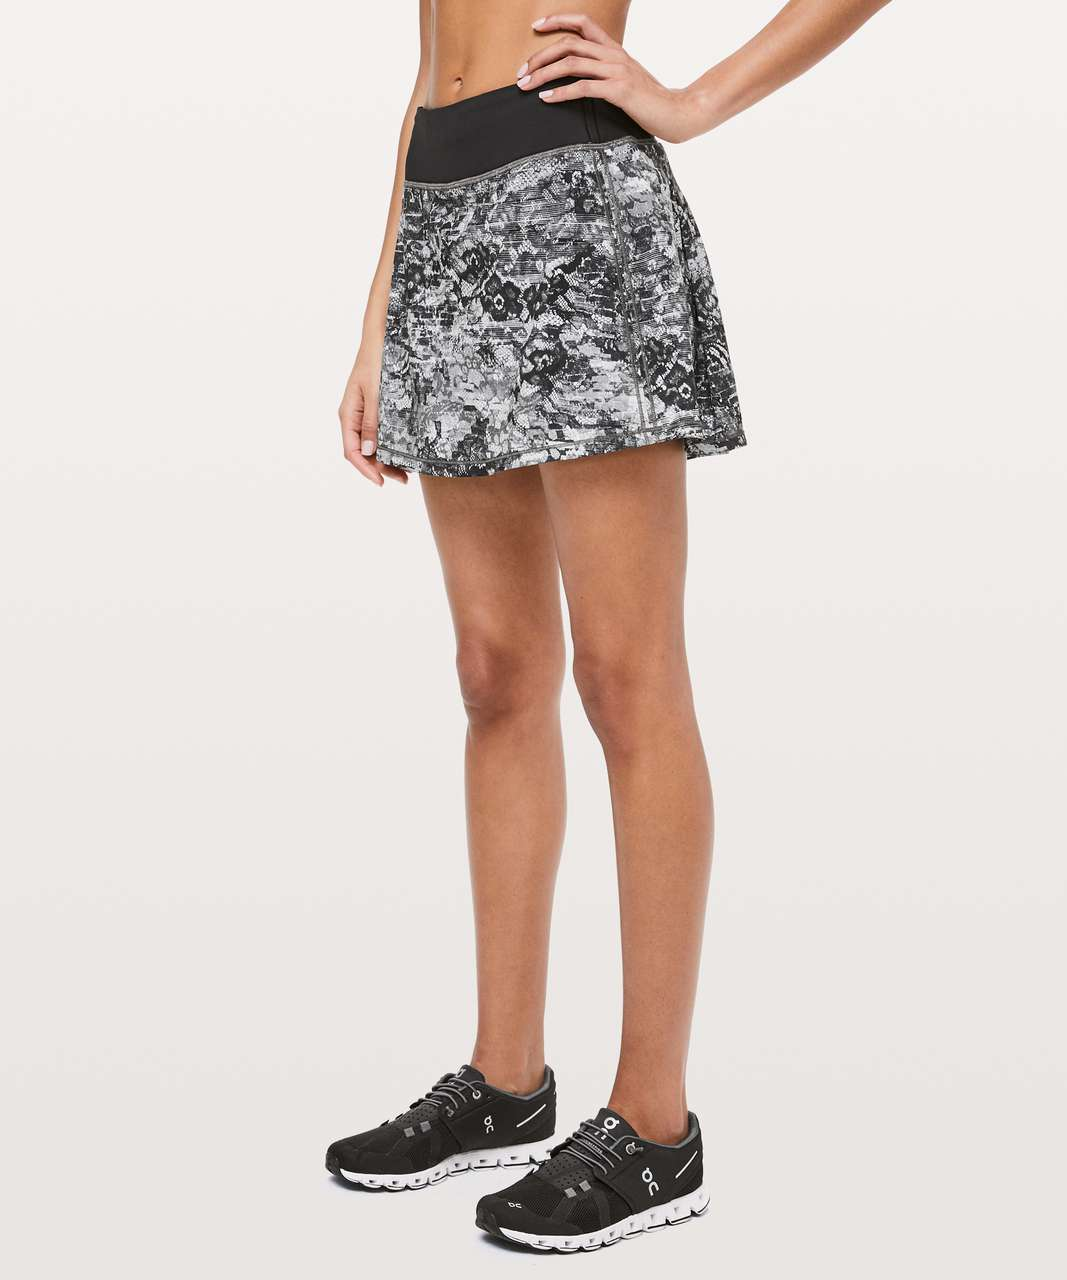 "Lululemon Pace Rival Skirt (Tall) *No Panels 15"" - Masked Lace Starlight Black / Black"